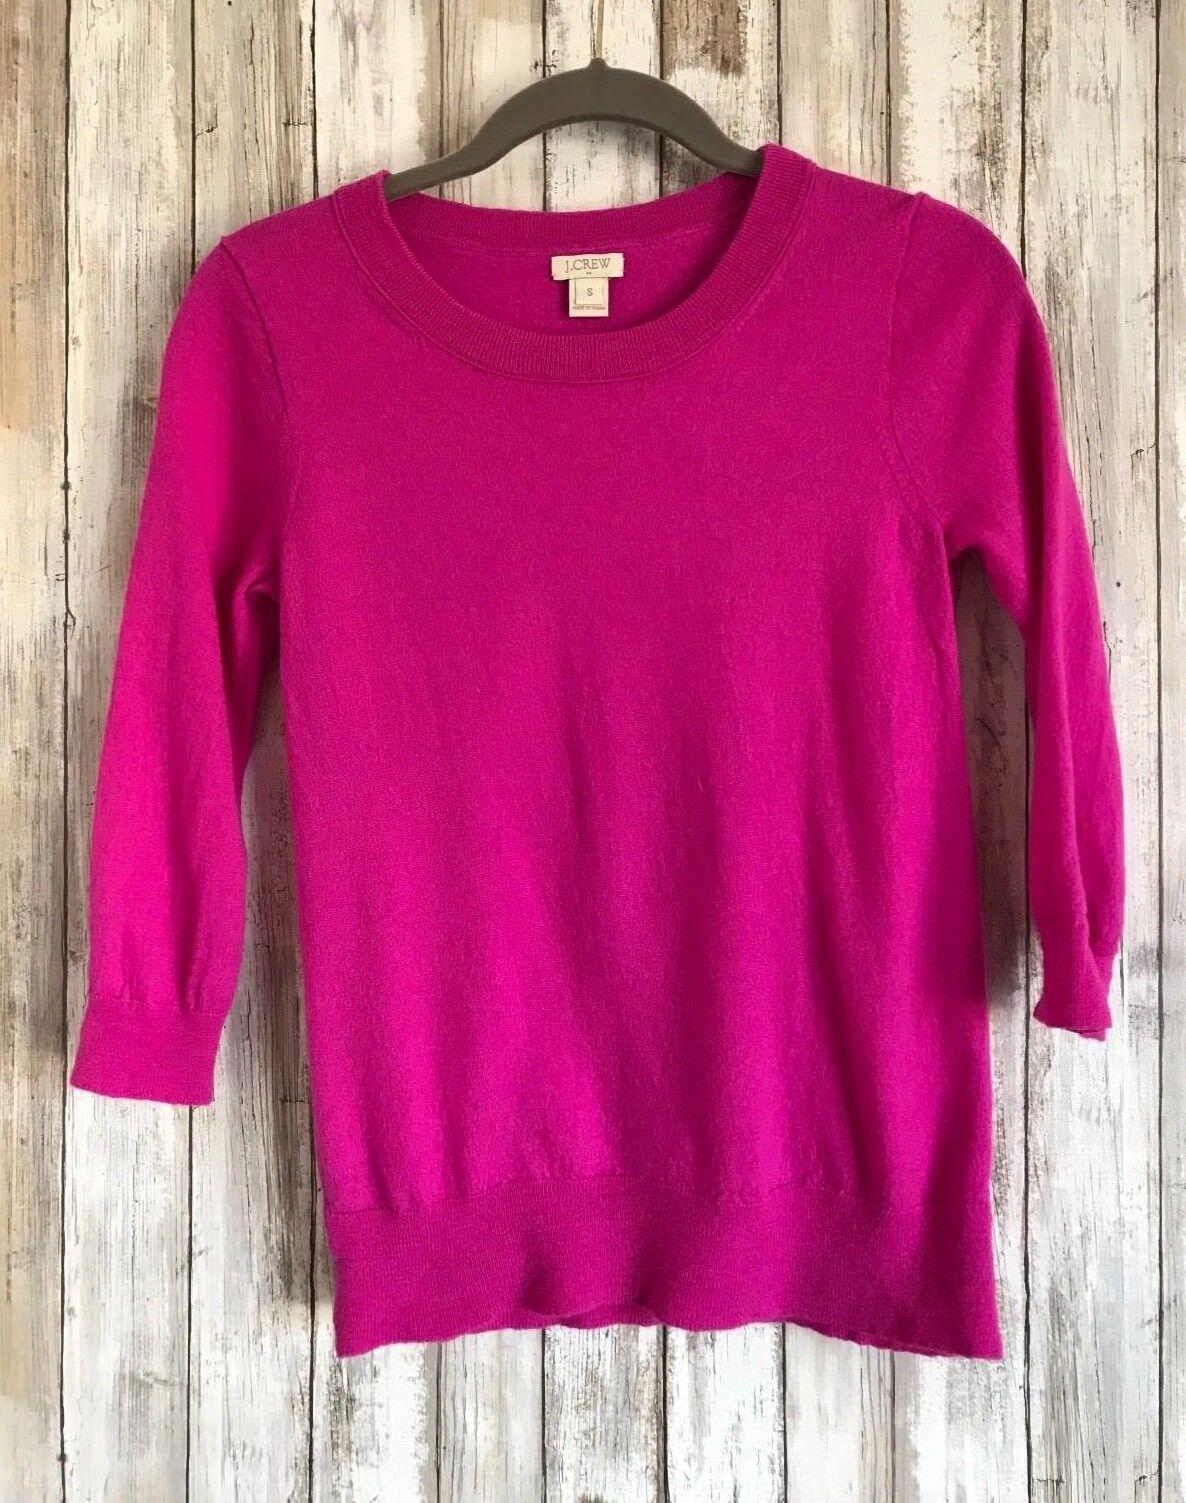 J. Crew Charley Pink Merino Wool 3 4 Sleeve Sweater S Small  CLASSIC